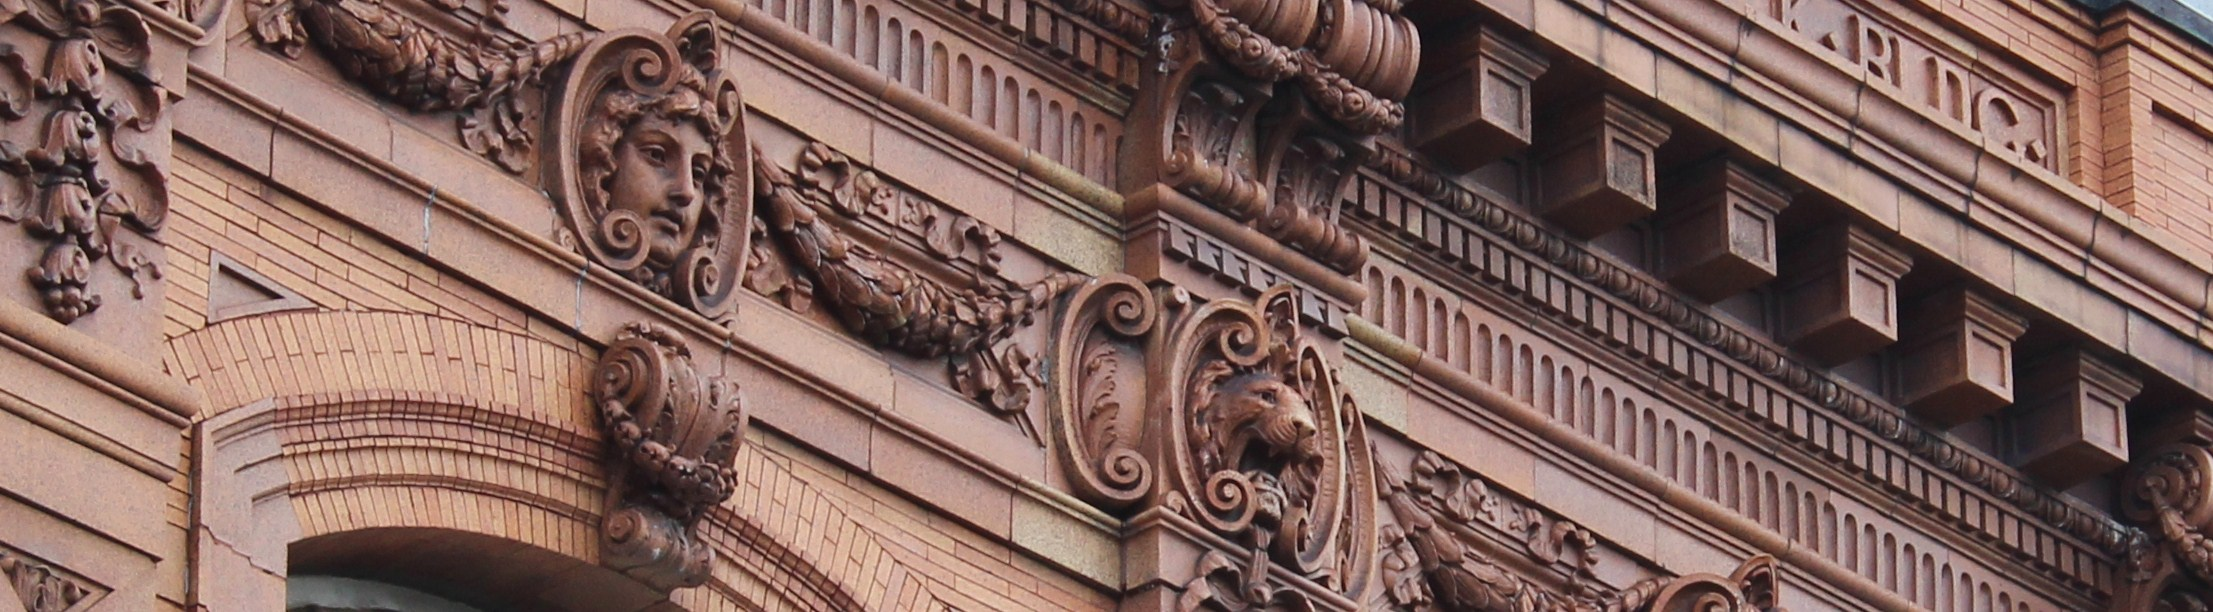 Ornate Building Facade